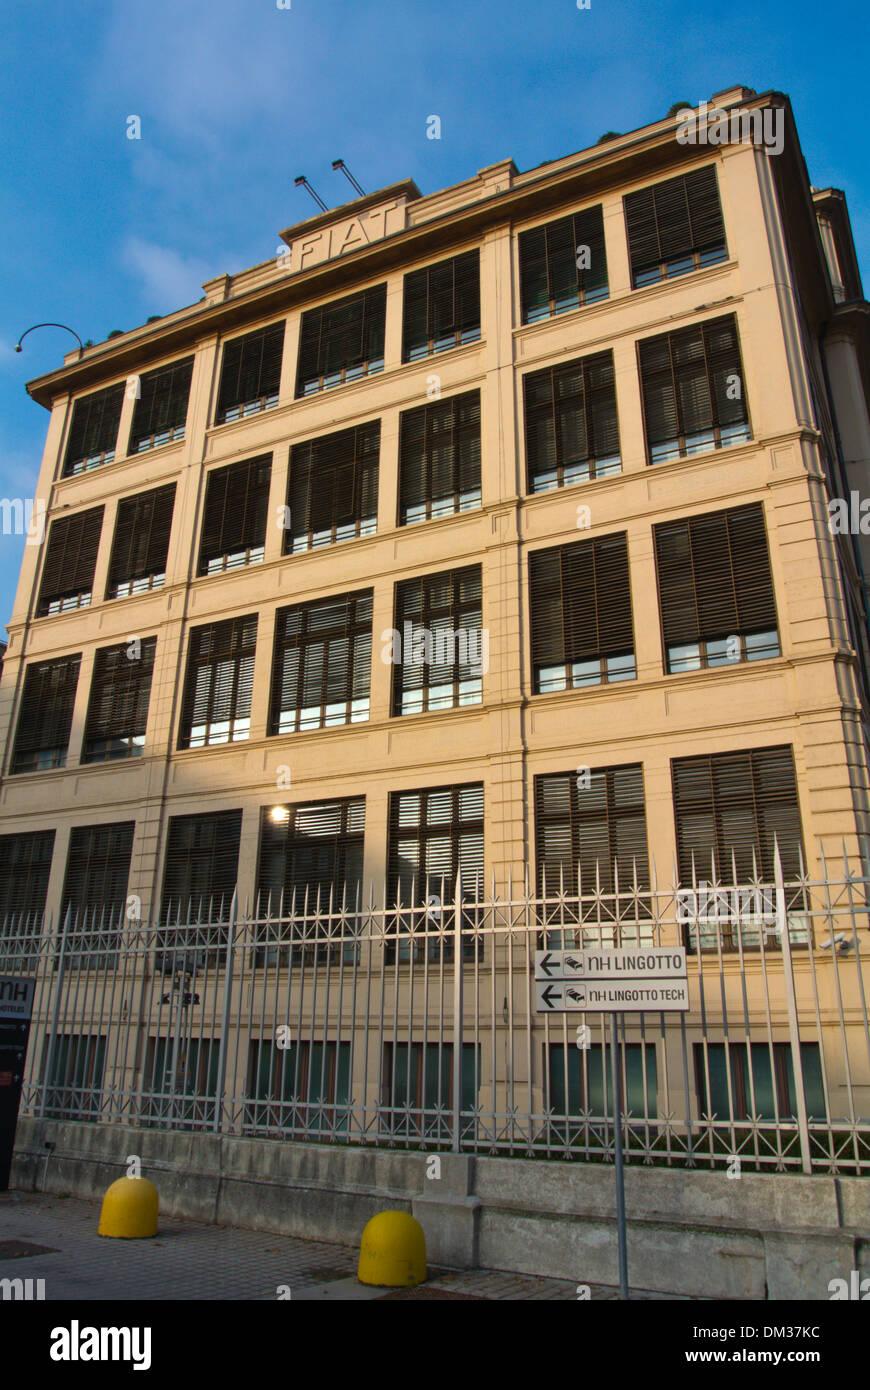 Fiat headquarter buildings Lingotto district Turin Piedmont region Italy Europe - Stock Image